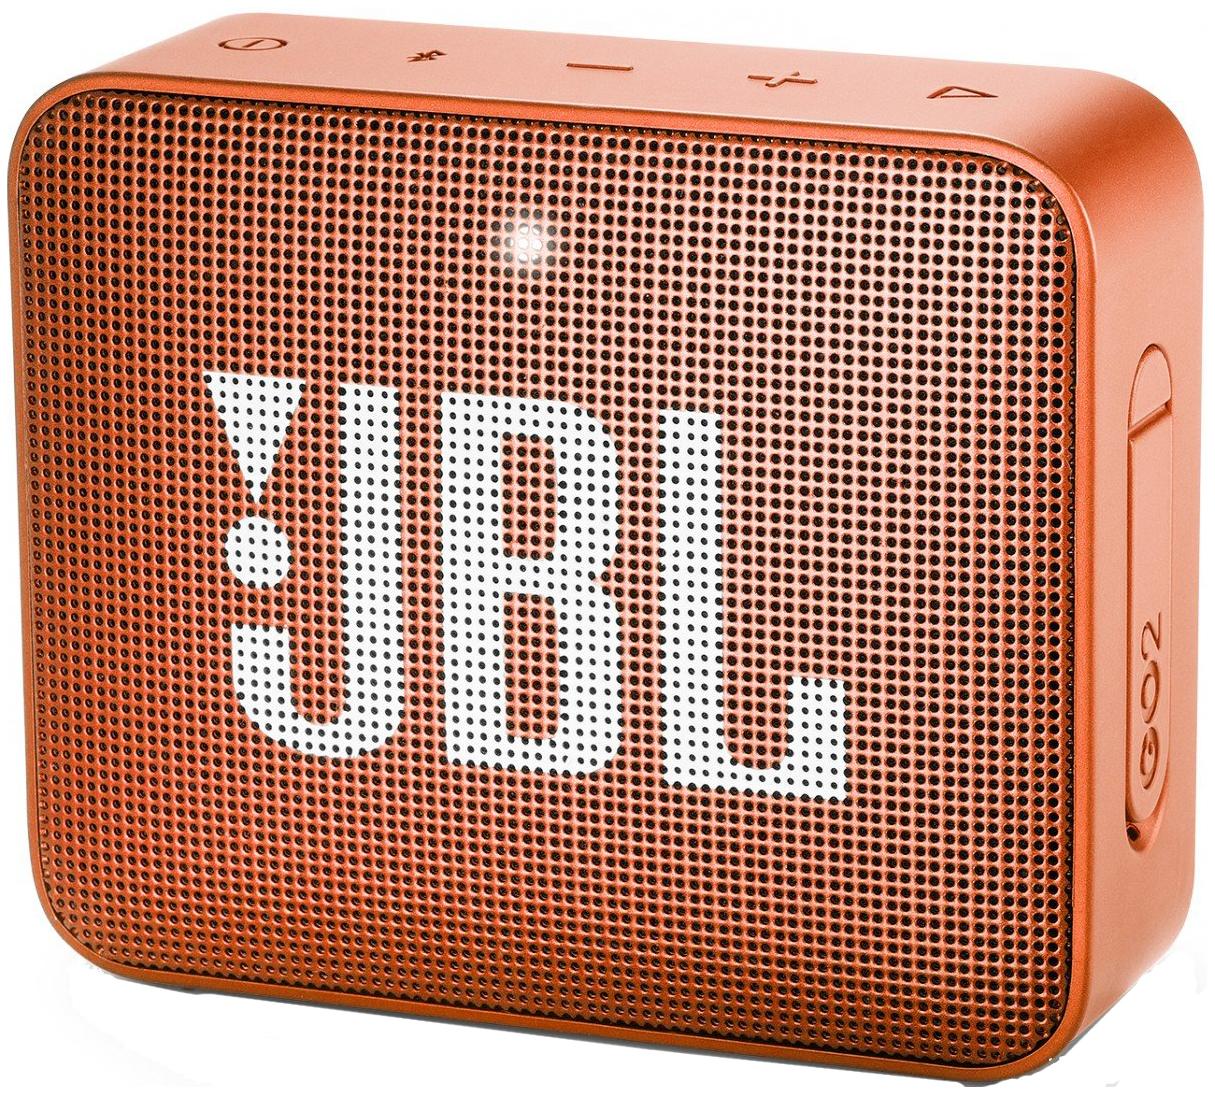 Беспроводная акустика JBL Go 2 JBLGO2ORG